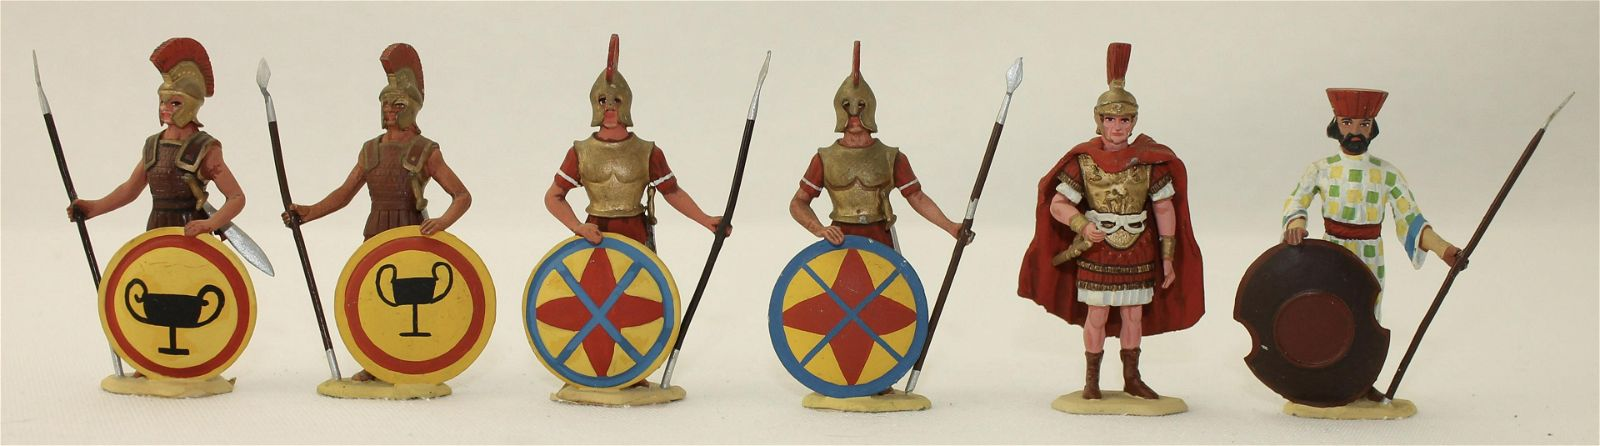 Tradition of London Lot Greeks Romans